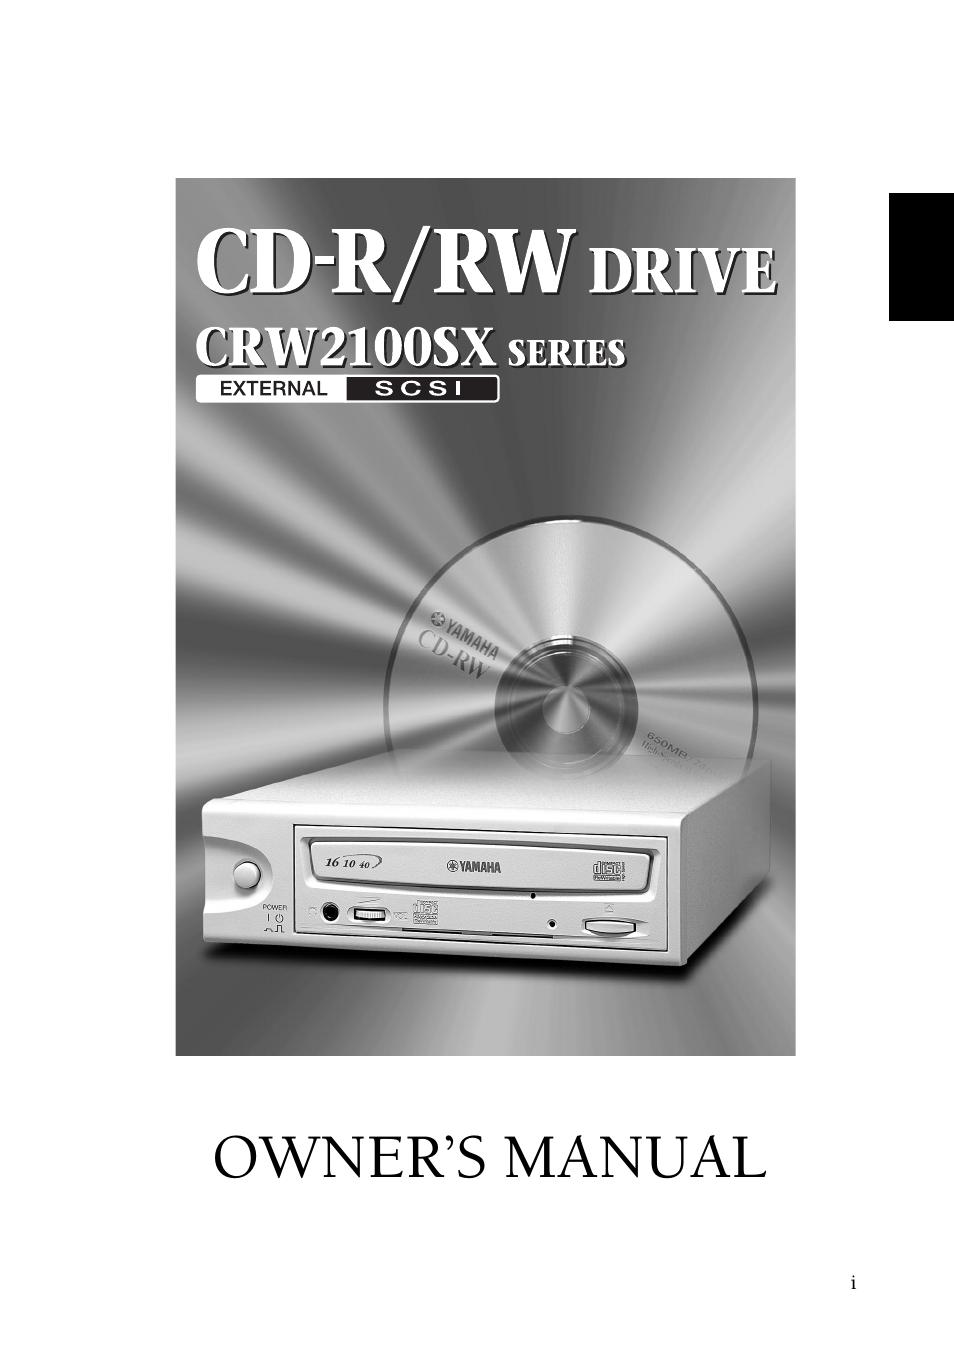 Yamaha External SCSI CRW2100SX CD-RW Drive